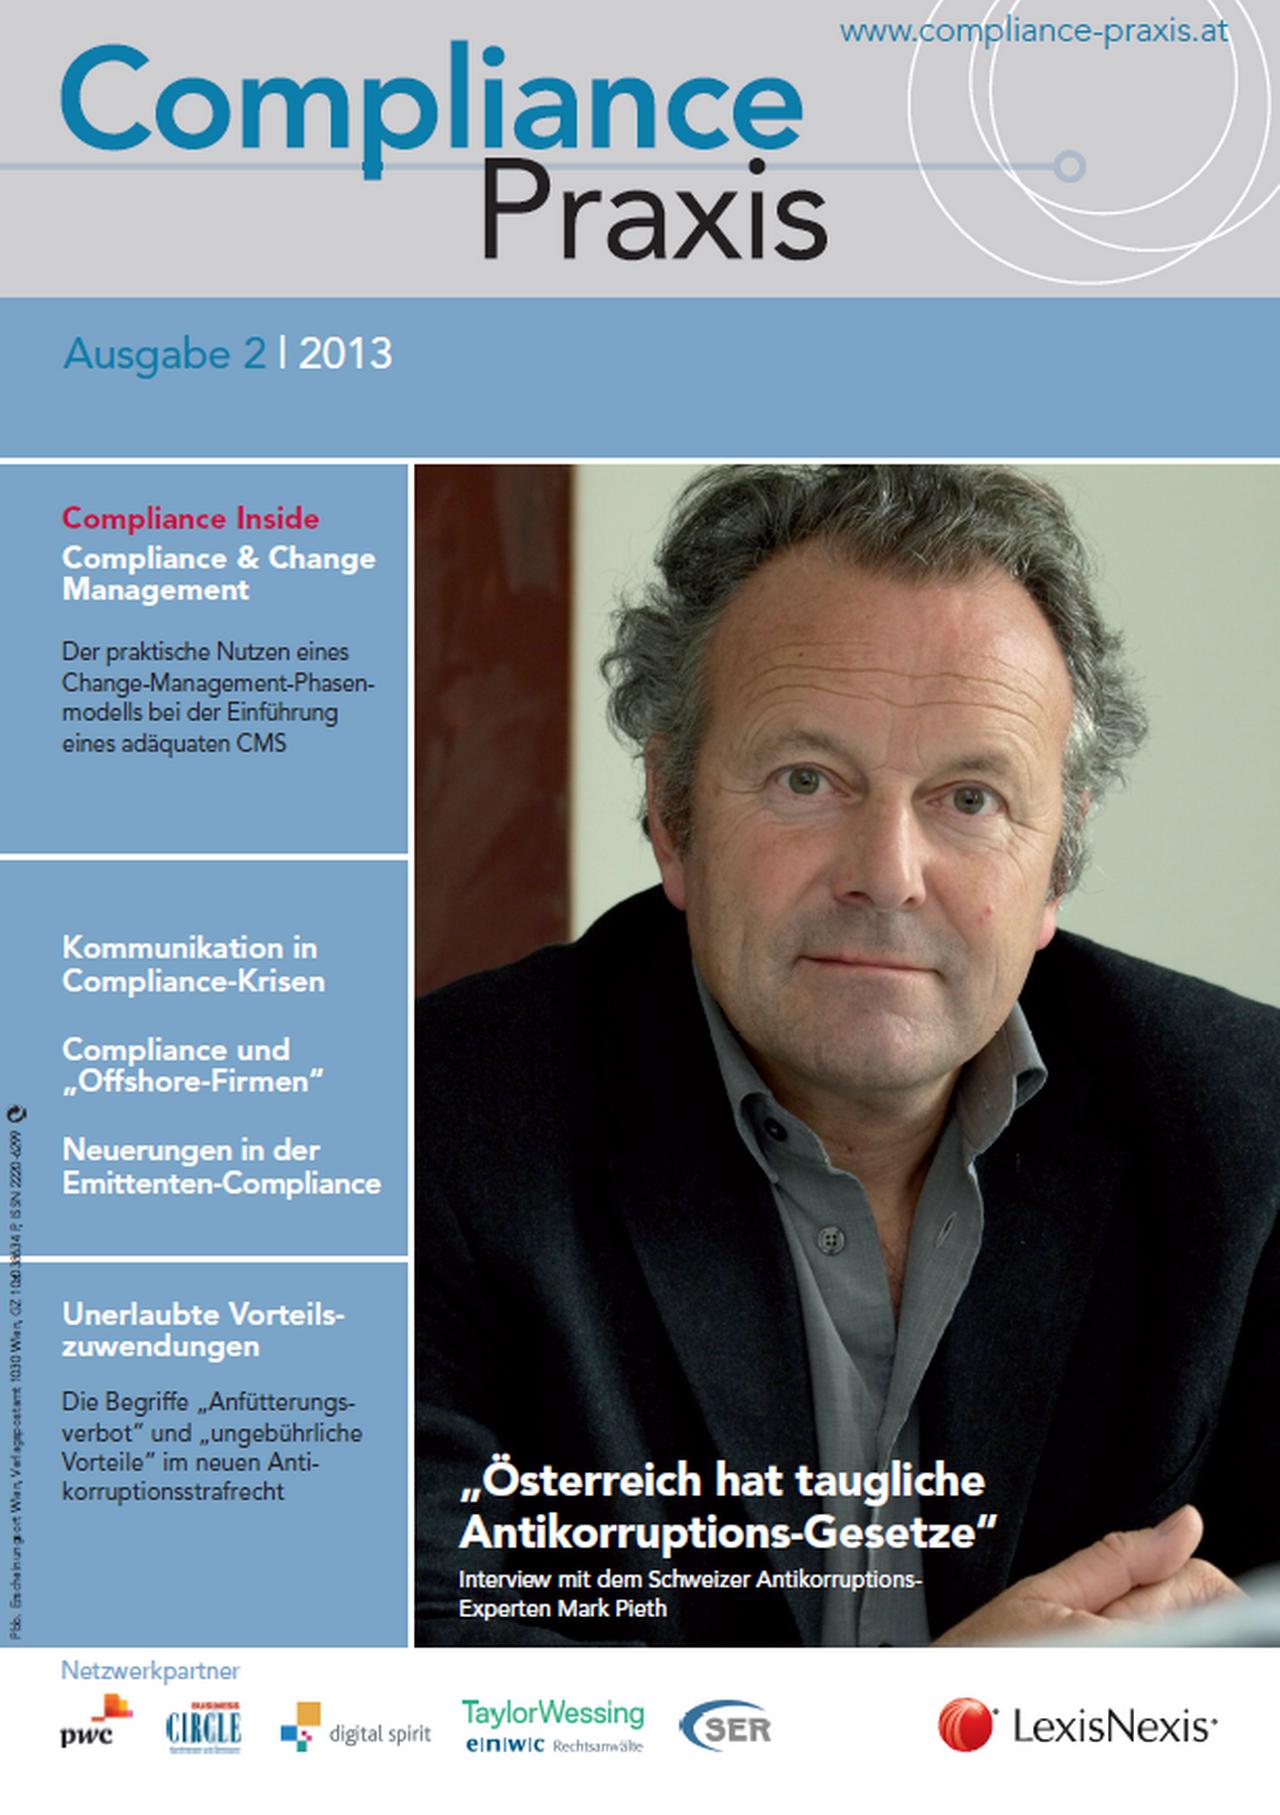 Cover von Compliance Praxis Ausgabe 2/2013, © LexisNexis